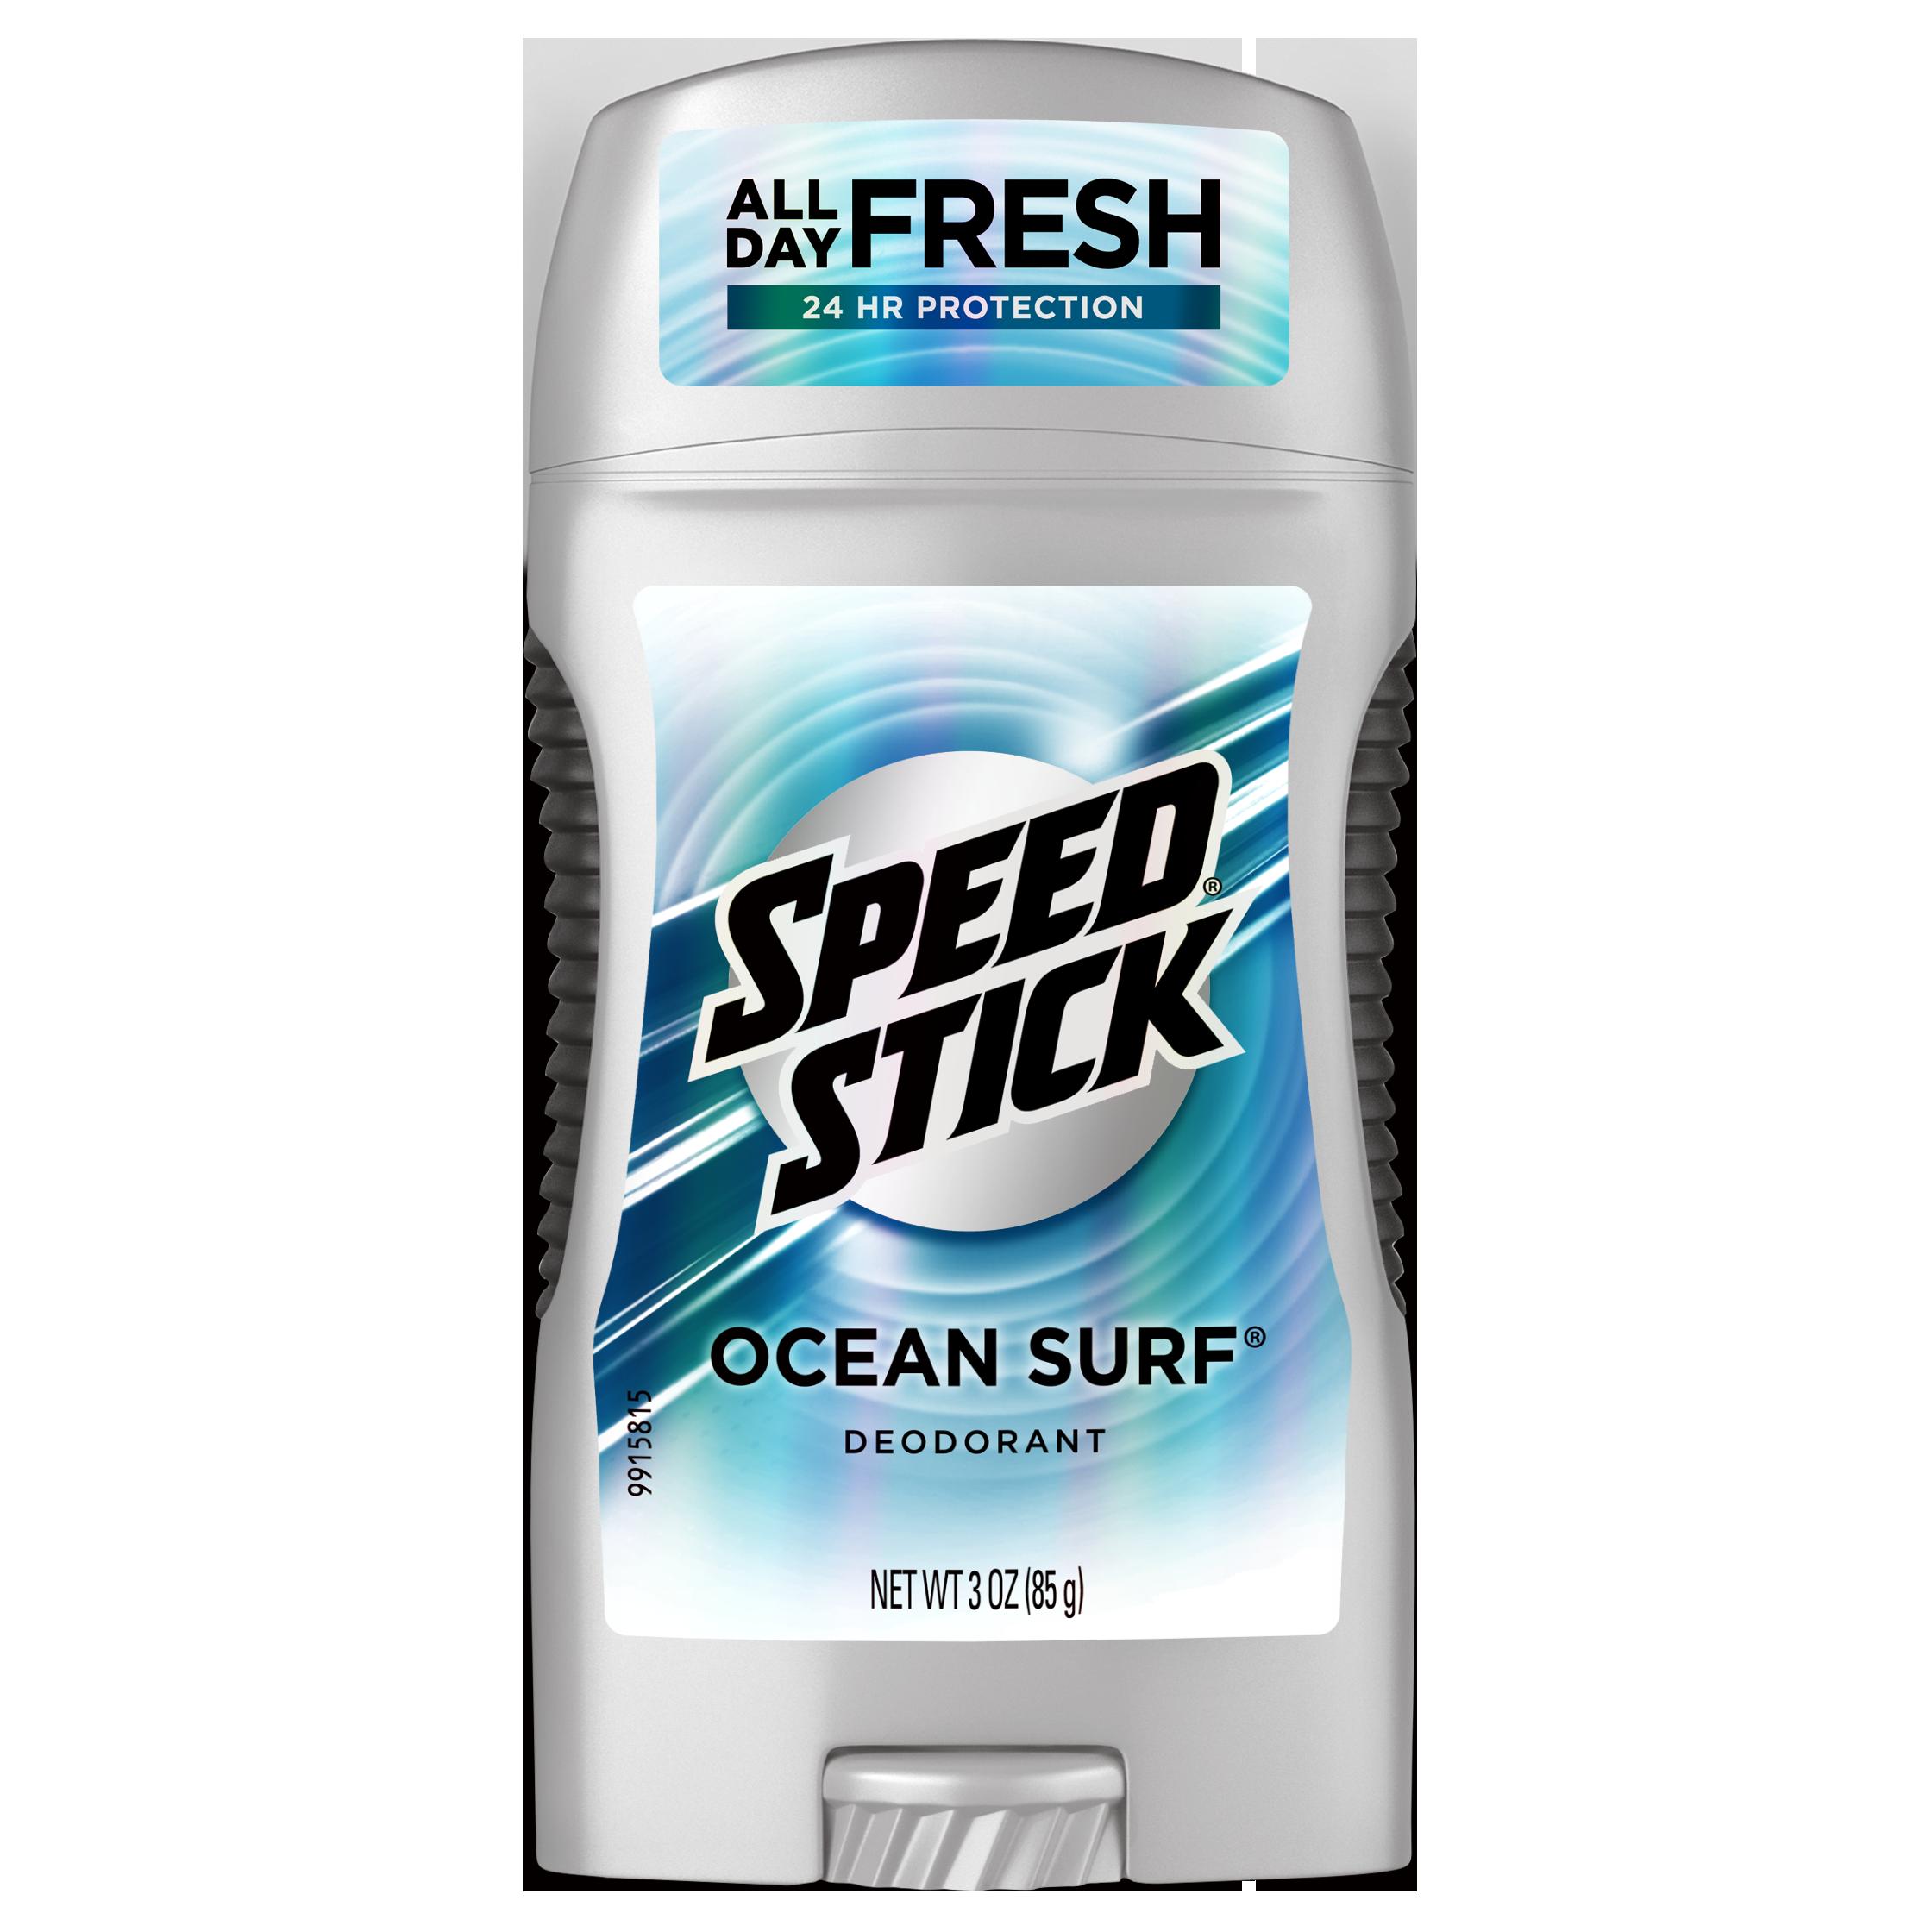 Speed Stick Deodorant, Ocean Surf, 3 Oz Stick